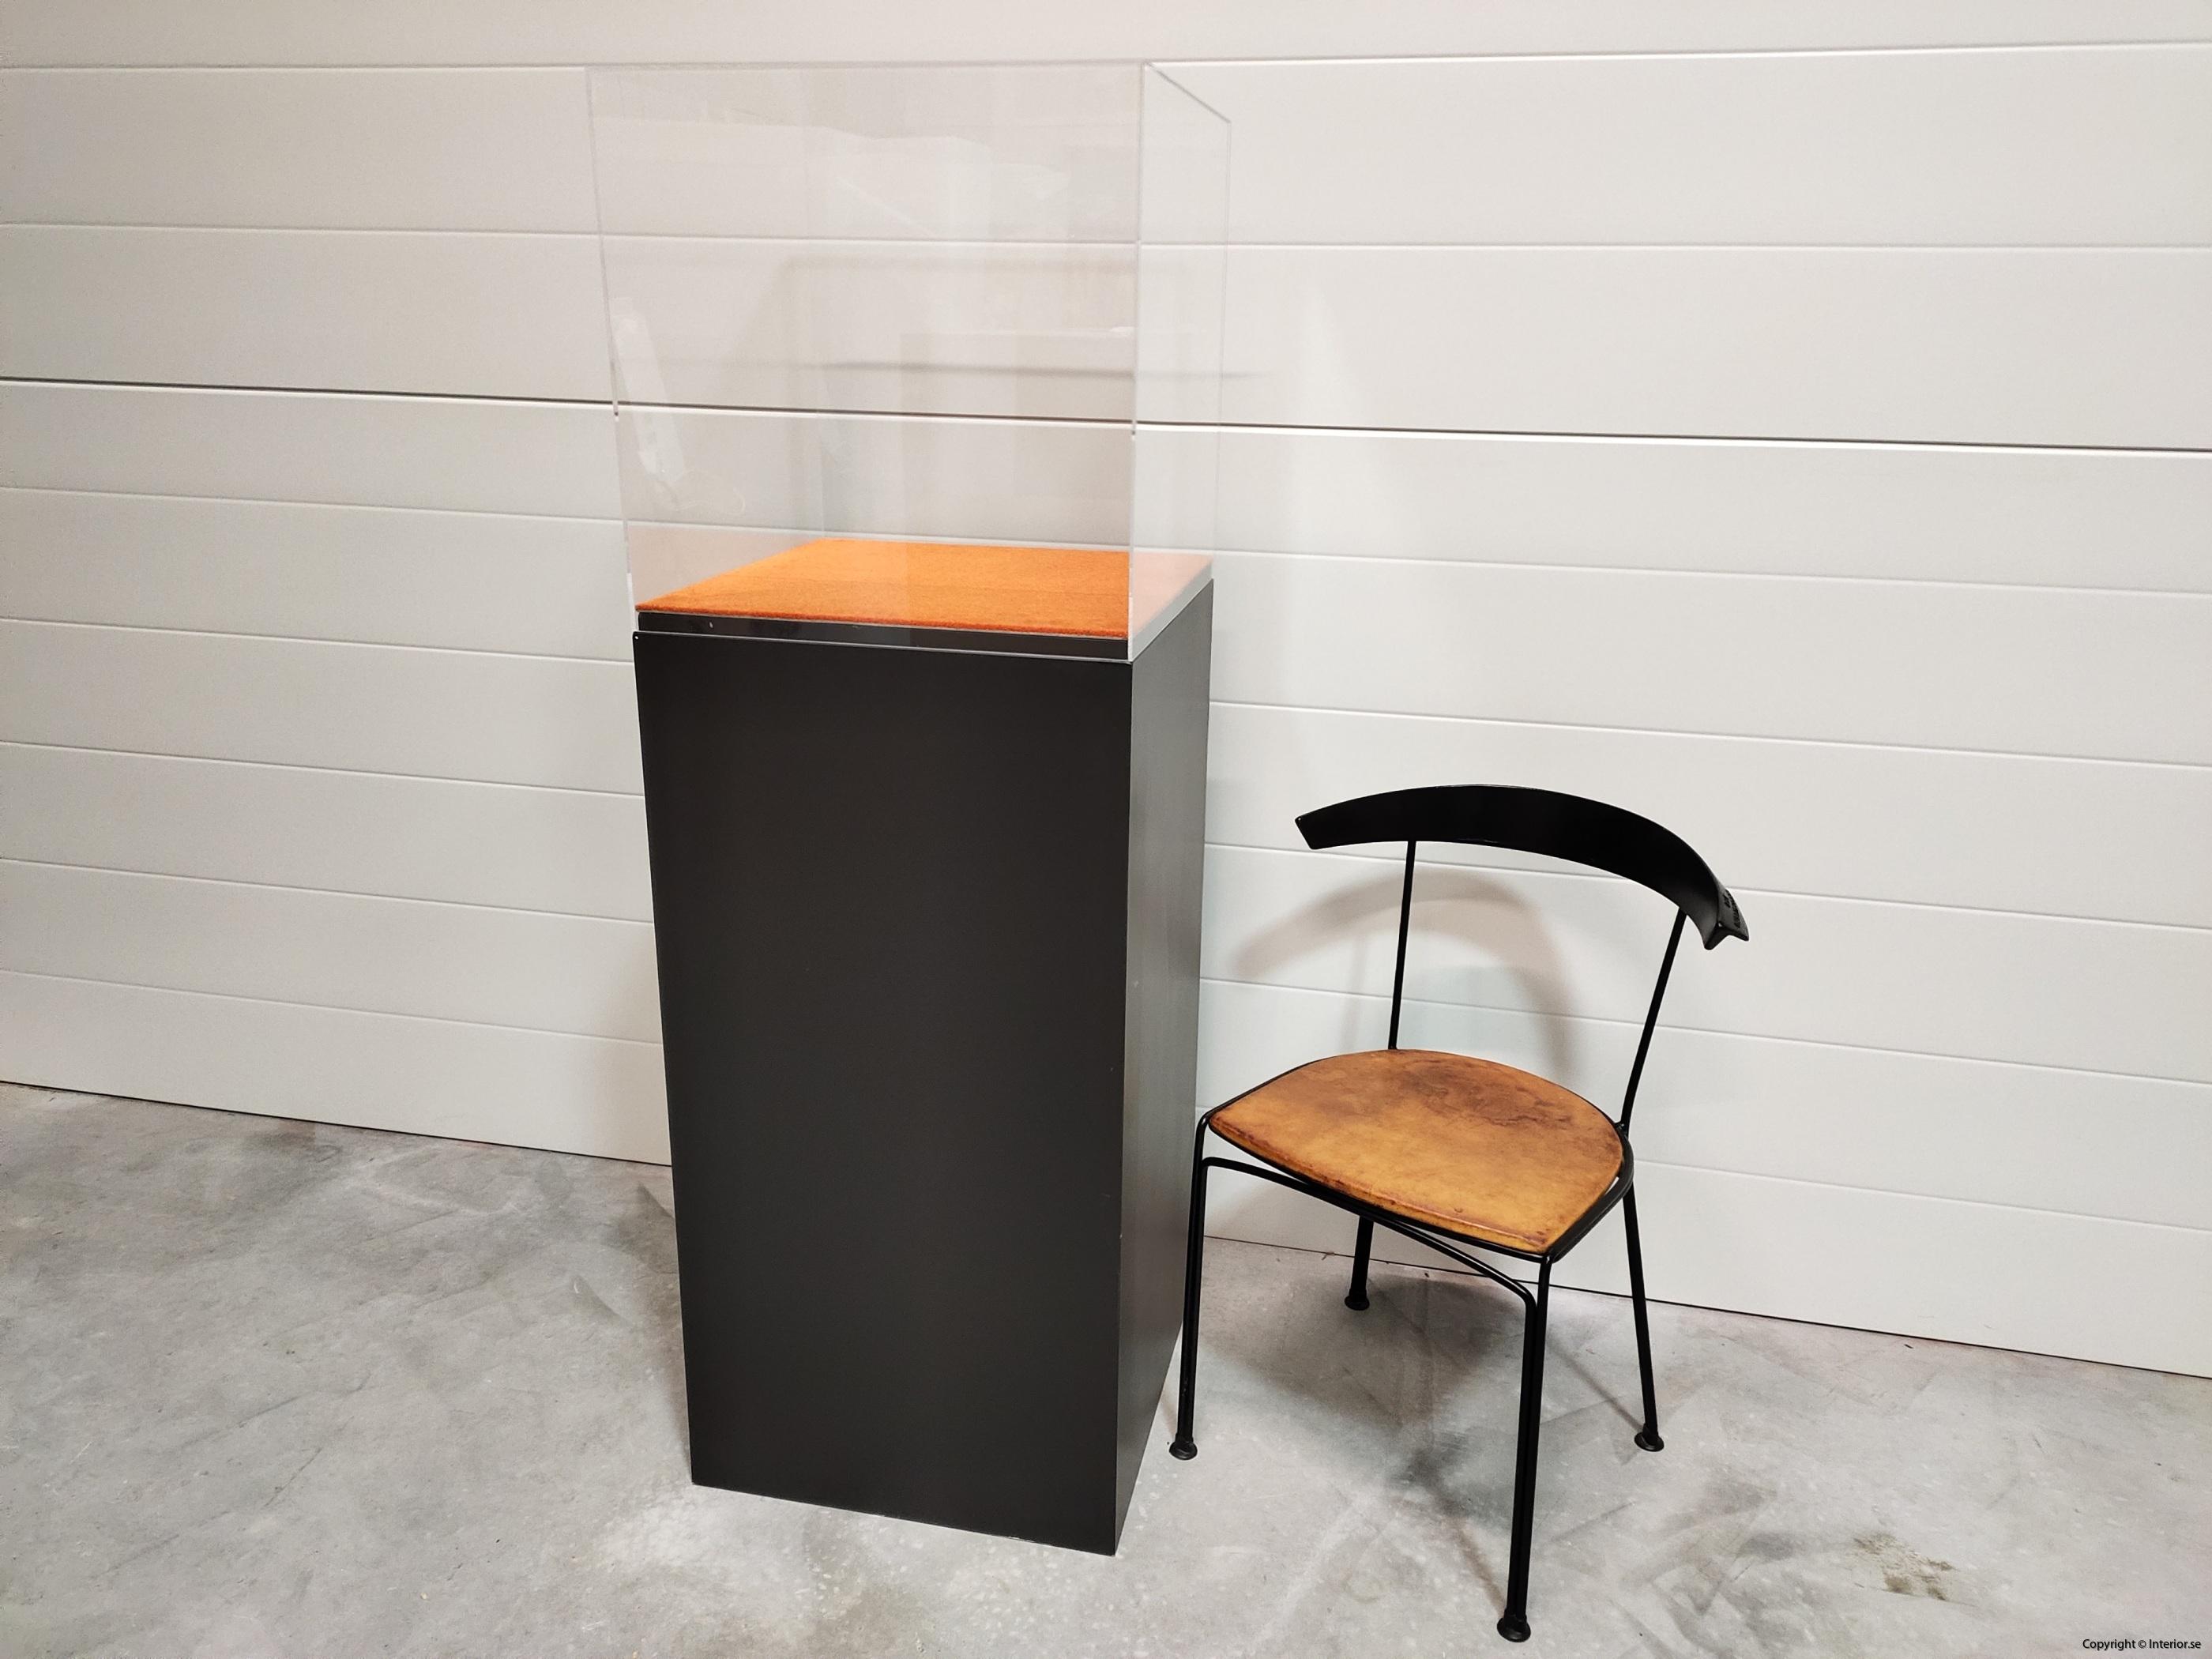 Utställningsmonter  Piedestal - 152 cm hyra monter stockholm (14)